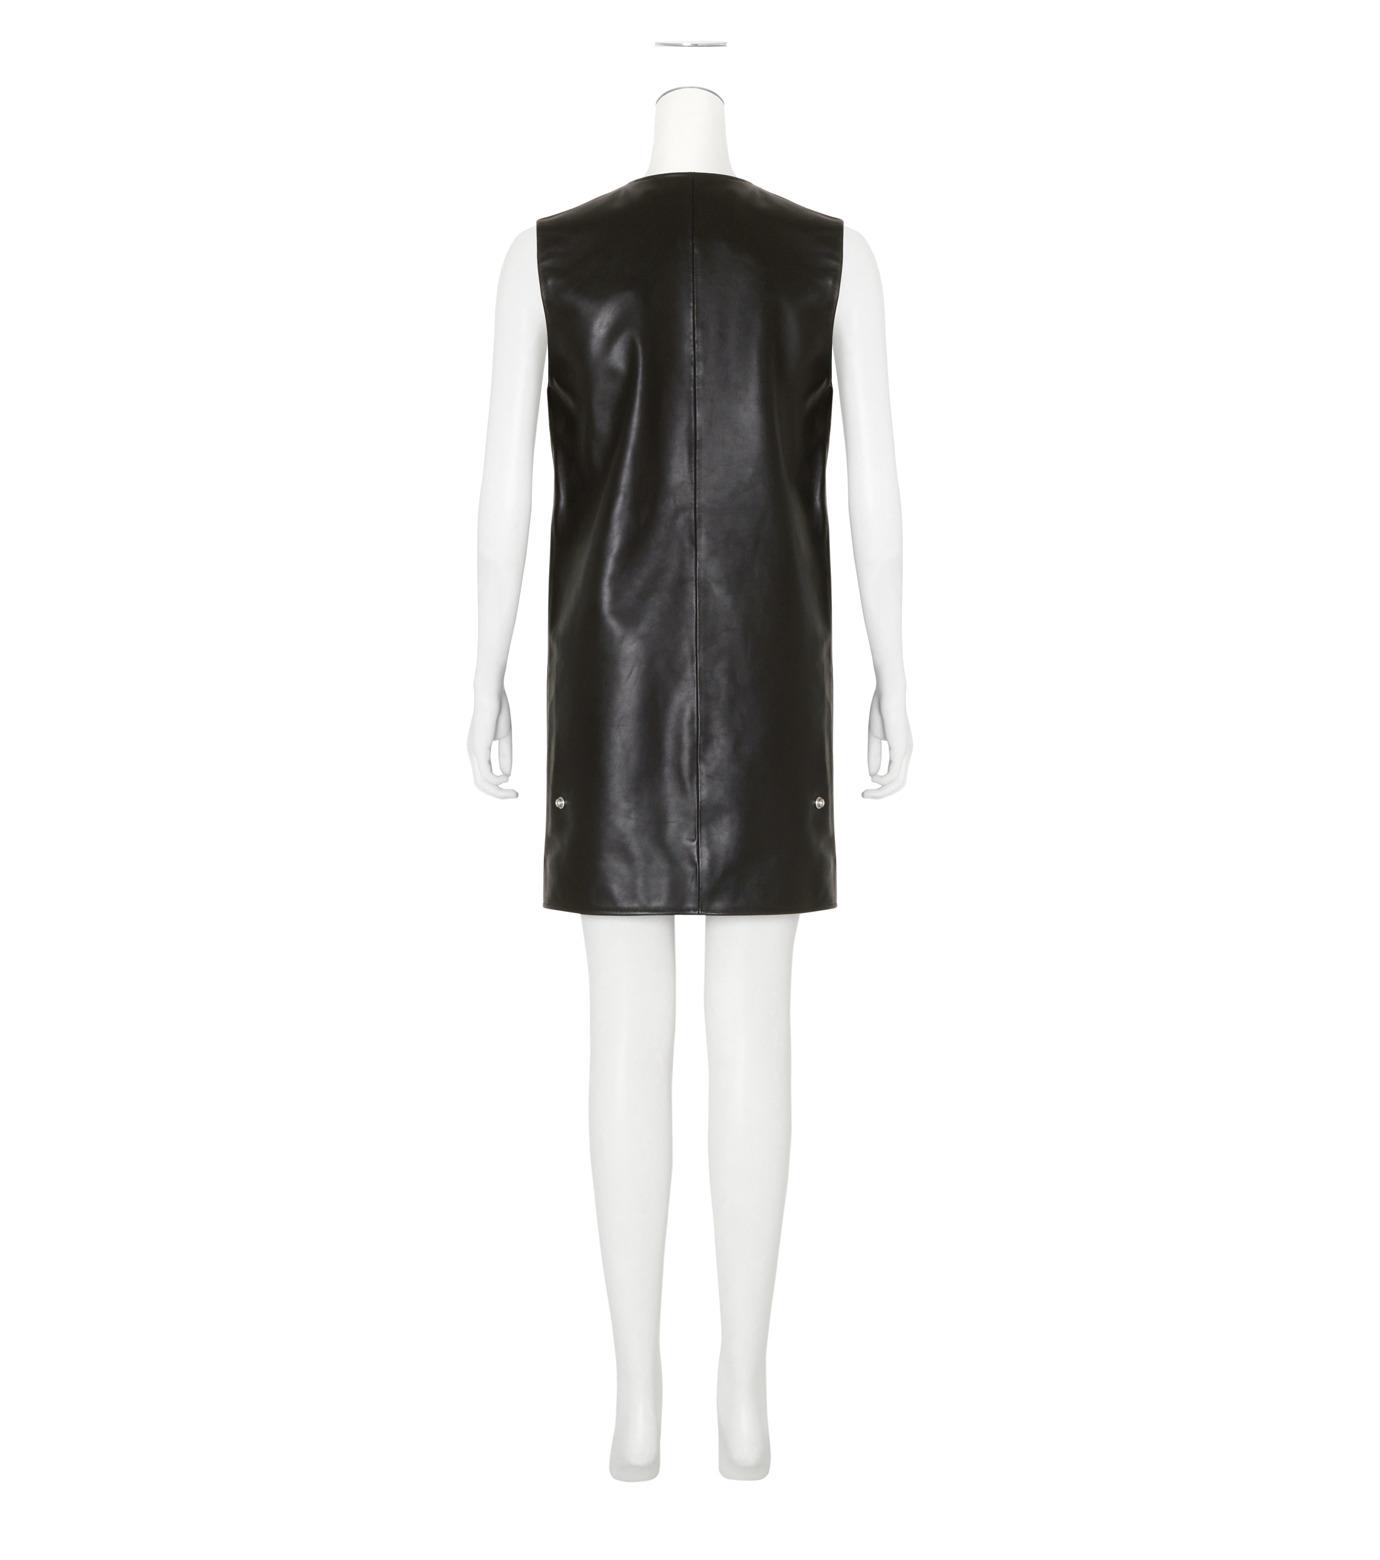 ACNE STUDIOS(アクネ ストゥディオズ)のCow Leather Sless Dress-BLACK(ワンピース/one piece)-1AJ164-13 拡大詳細画像2